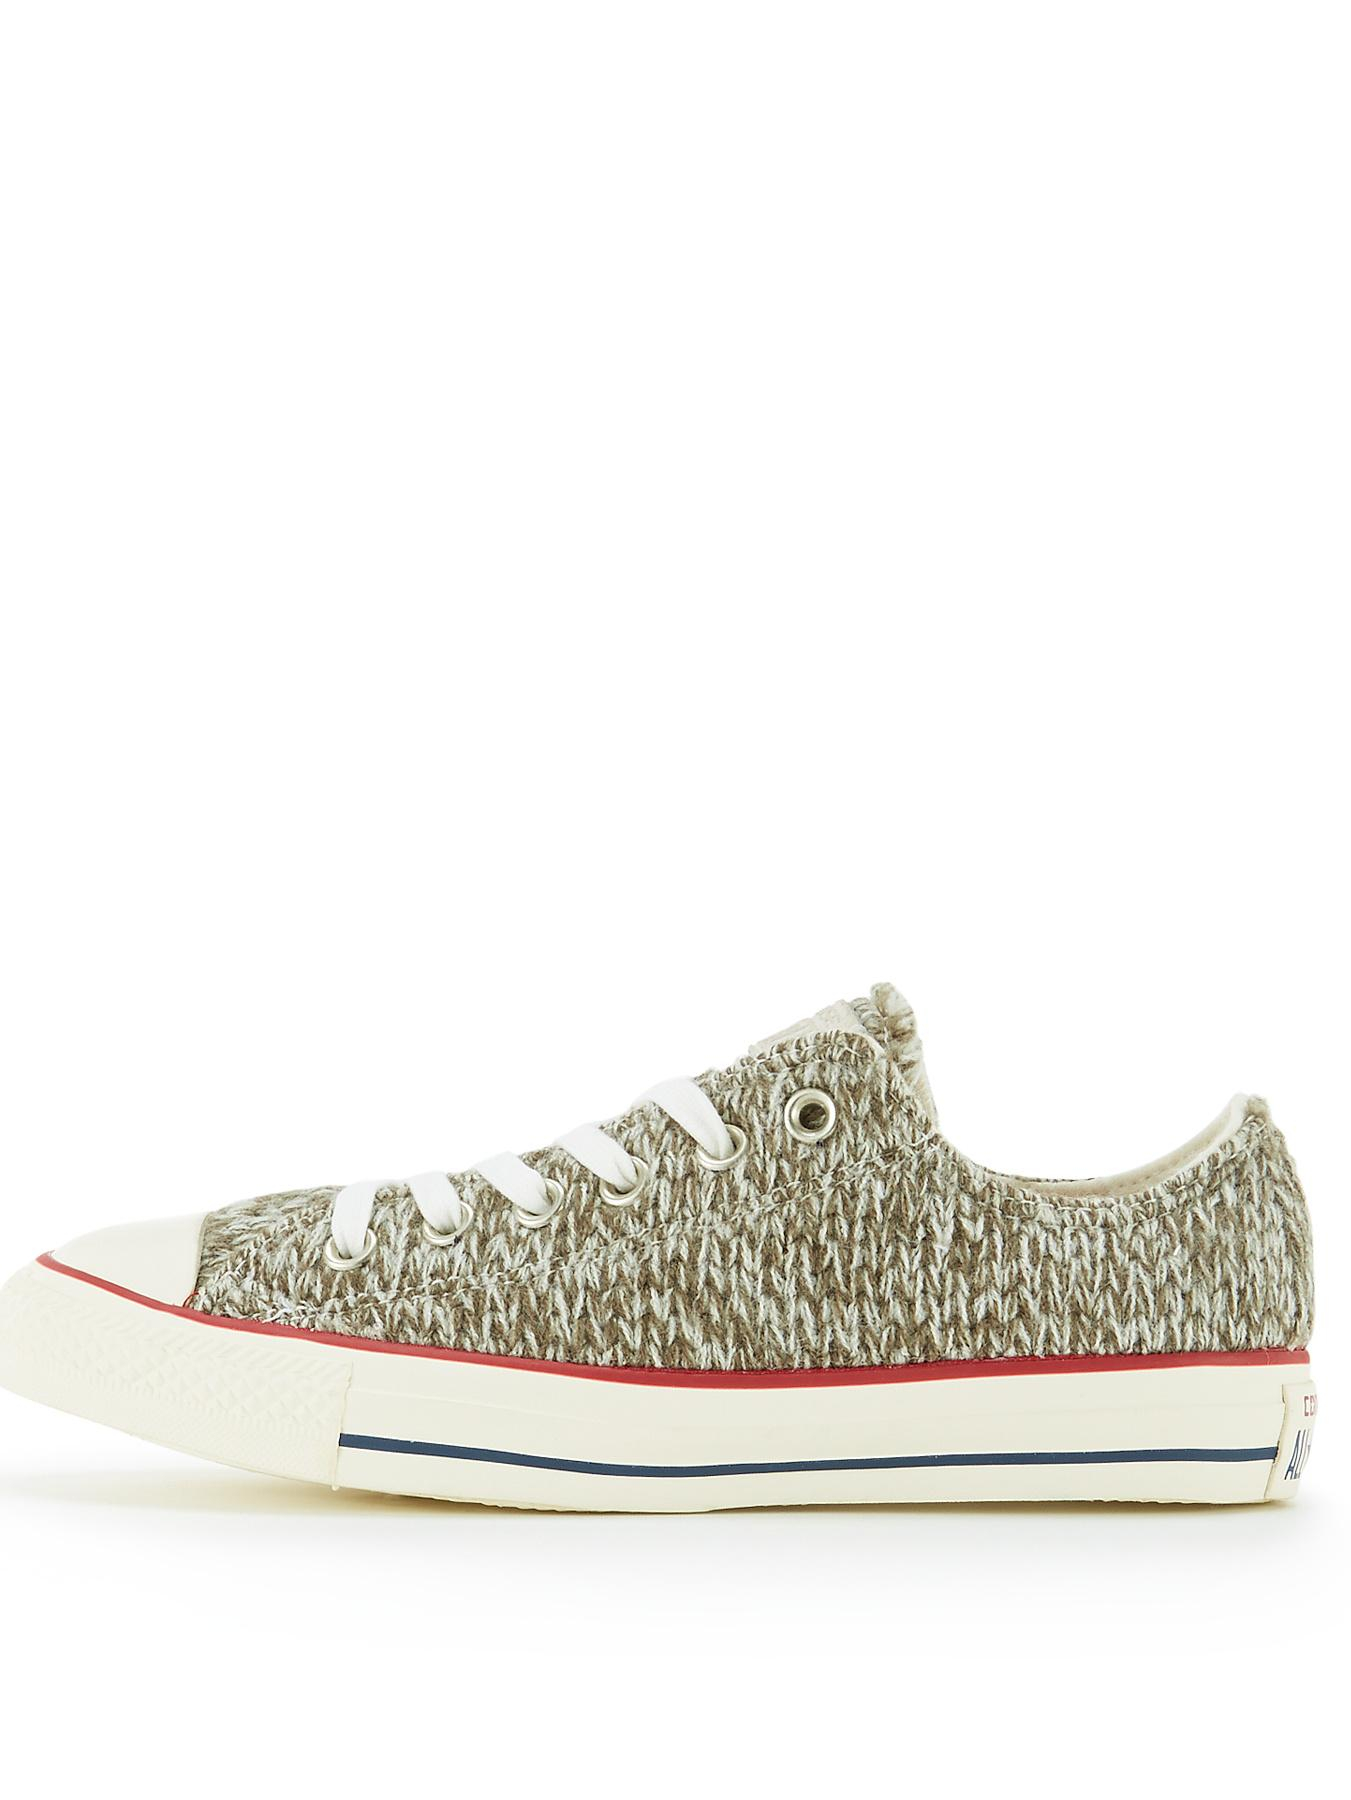 converse chuck taylor all star winter knit